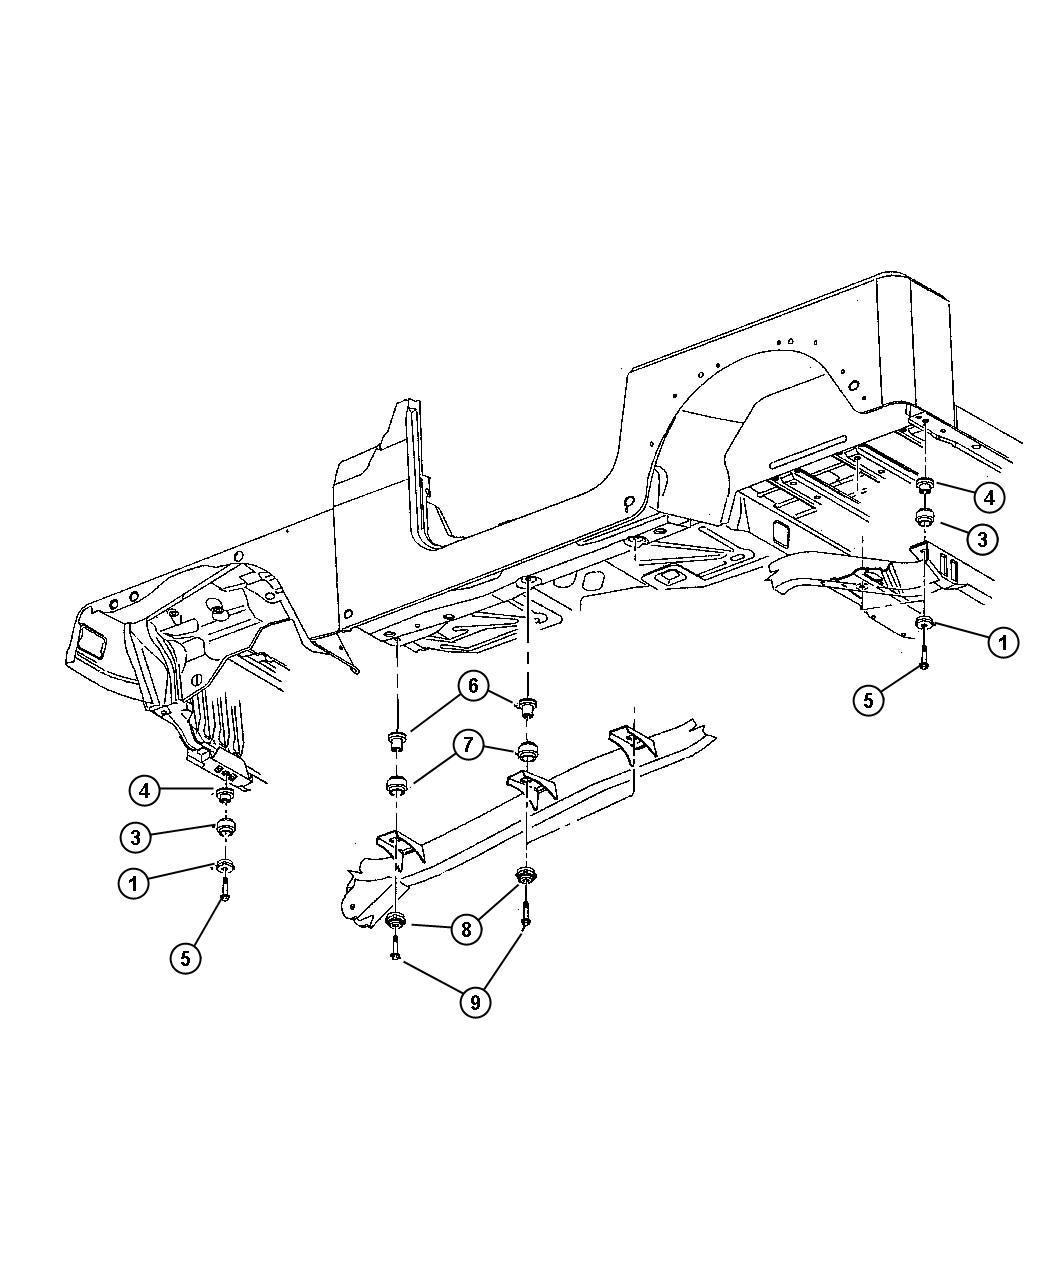 Jeep Wrangler Insulator Body Hold Down Upper Body Mount Mounting Battery